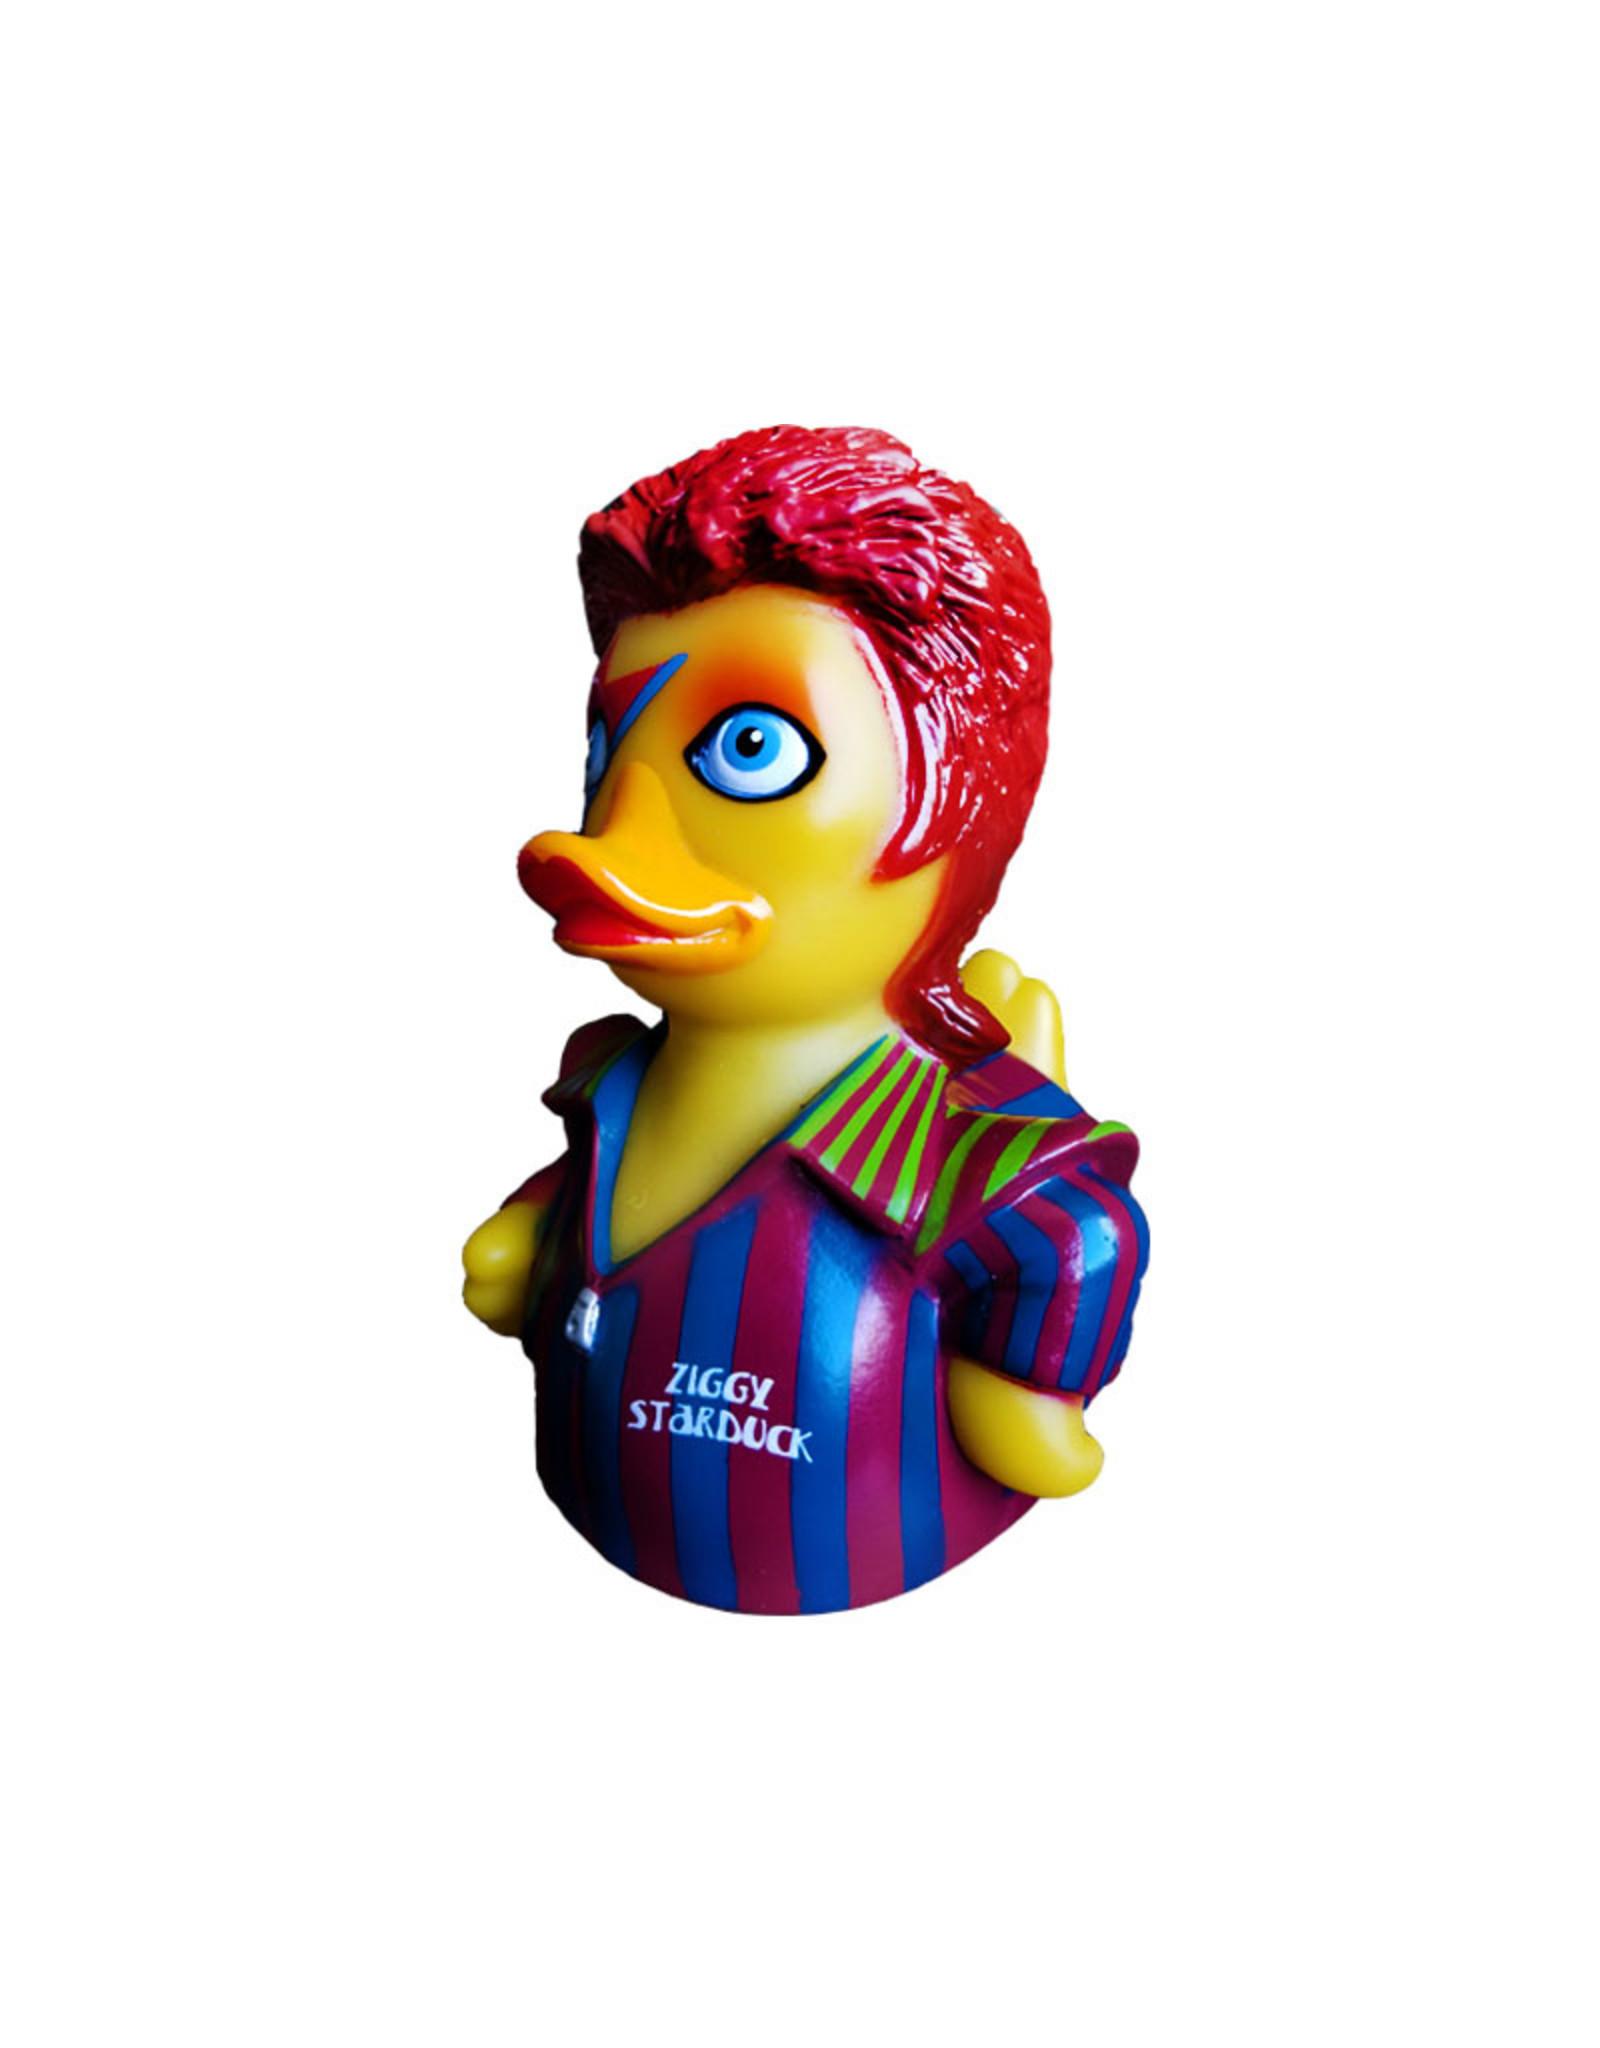 Ziggy Starduck Rubber Duck